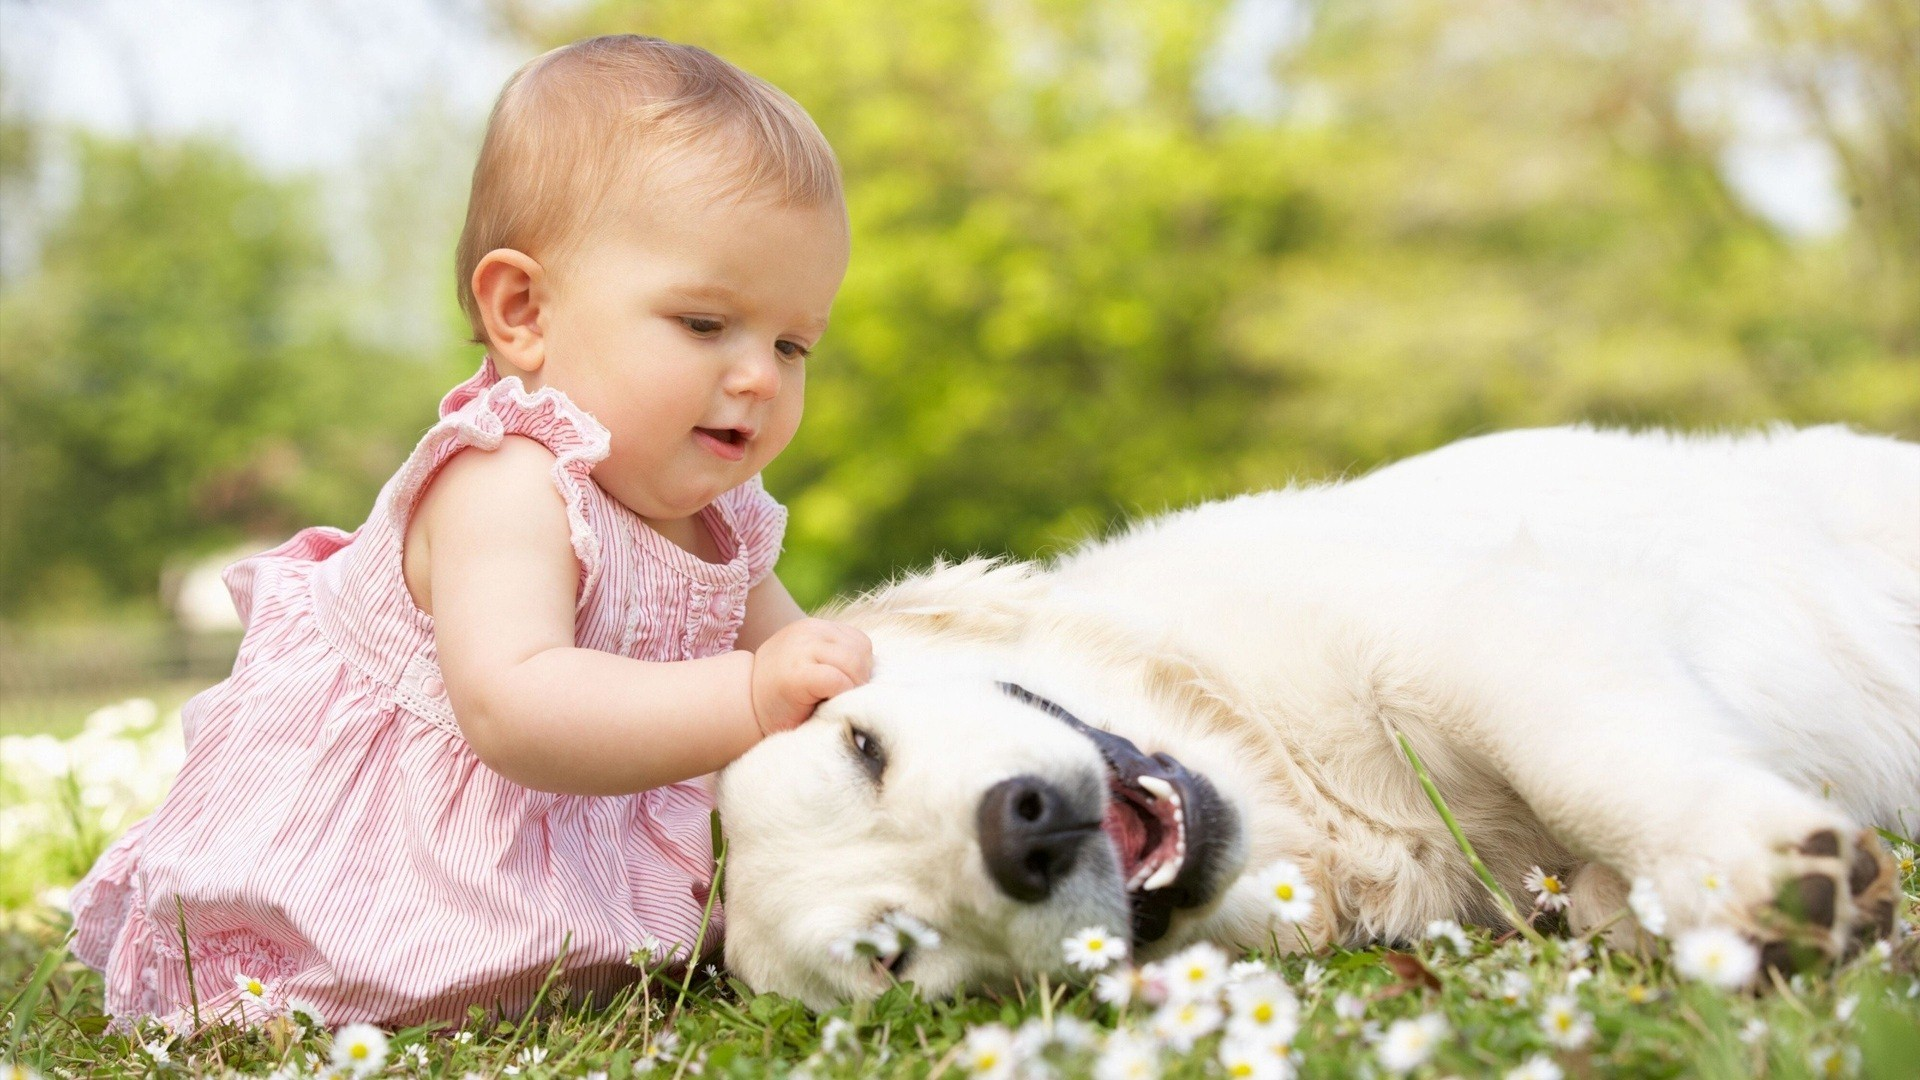 Cute Baby Girl Wallpapers | Free Download HD Beautiful Desktop Images